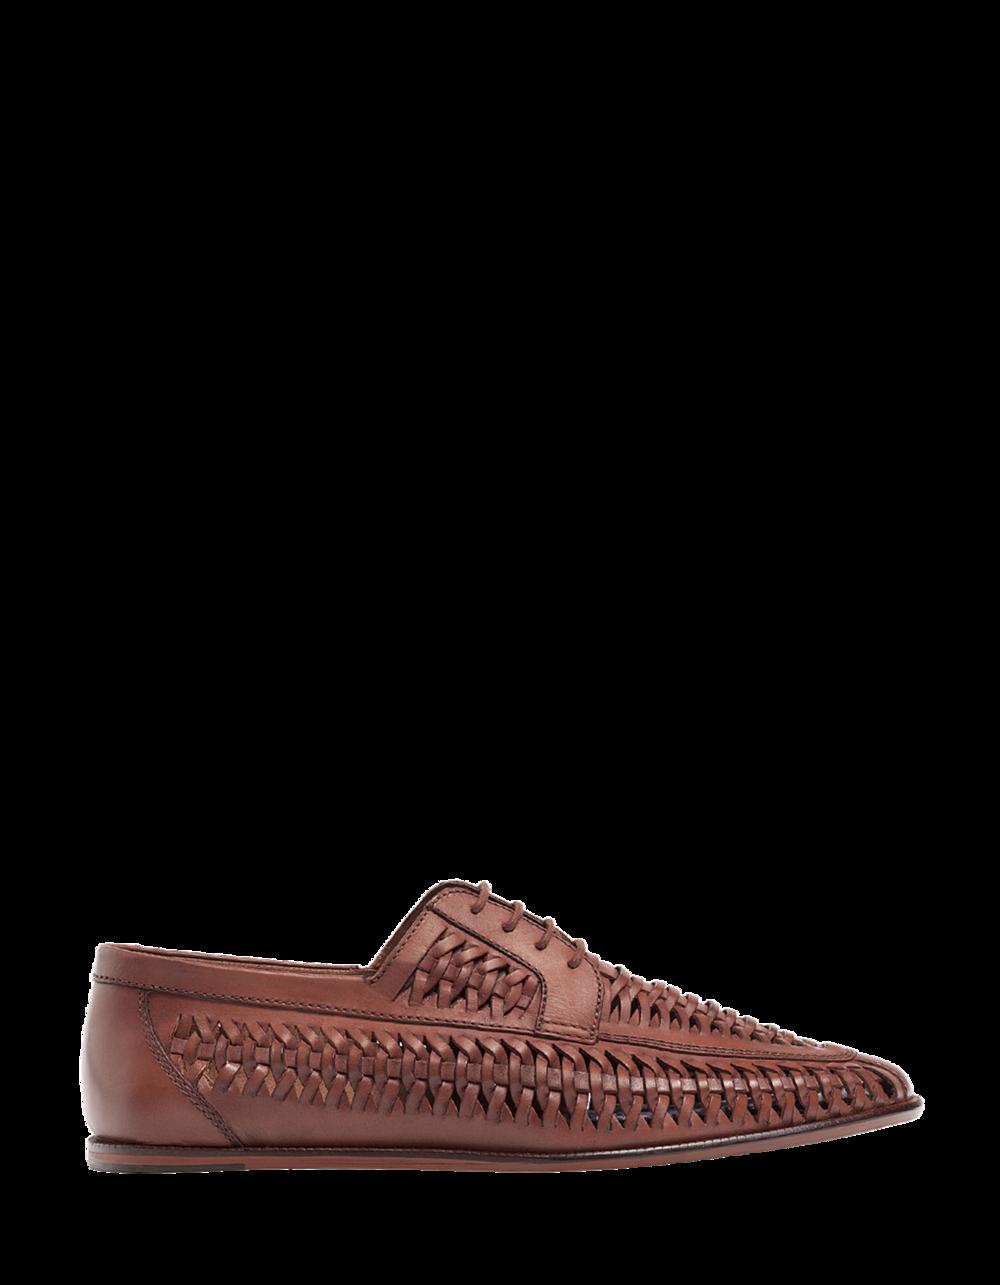 StradivariusMan_shoes (30).png